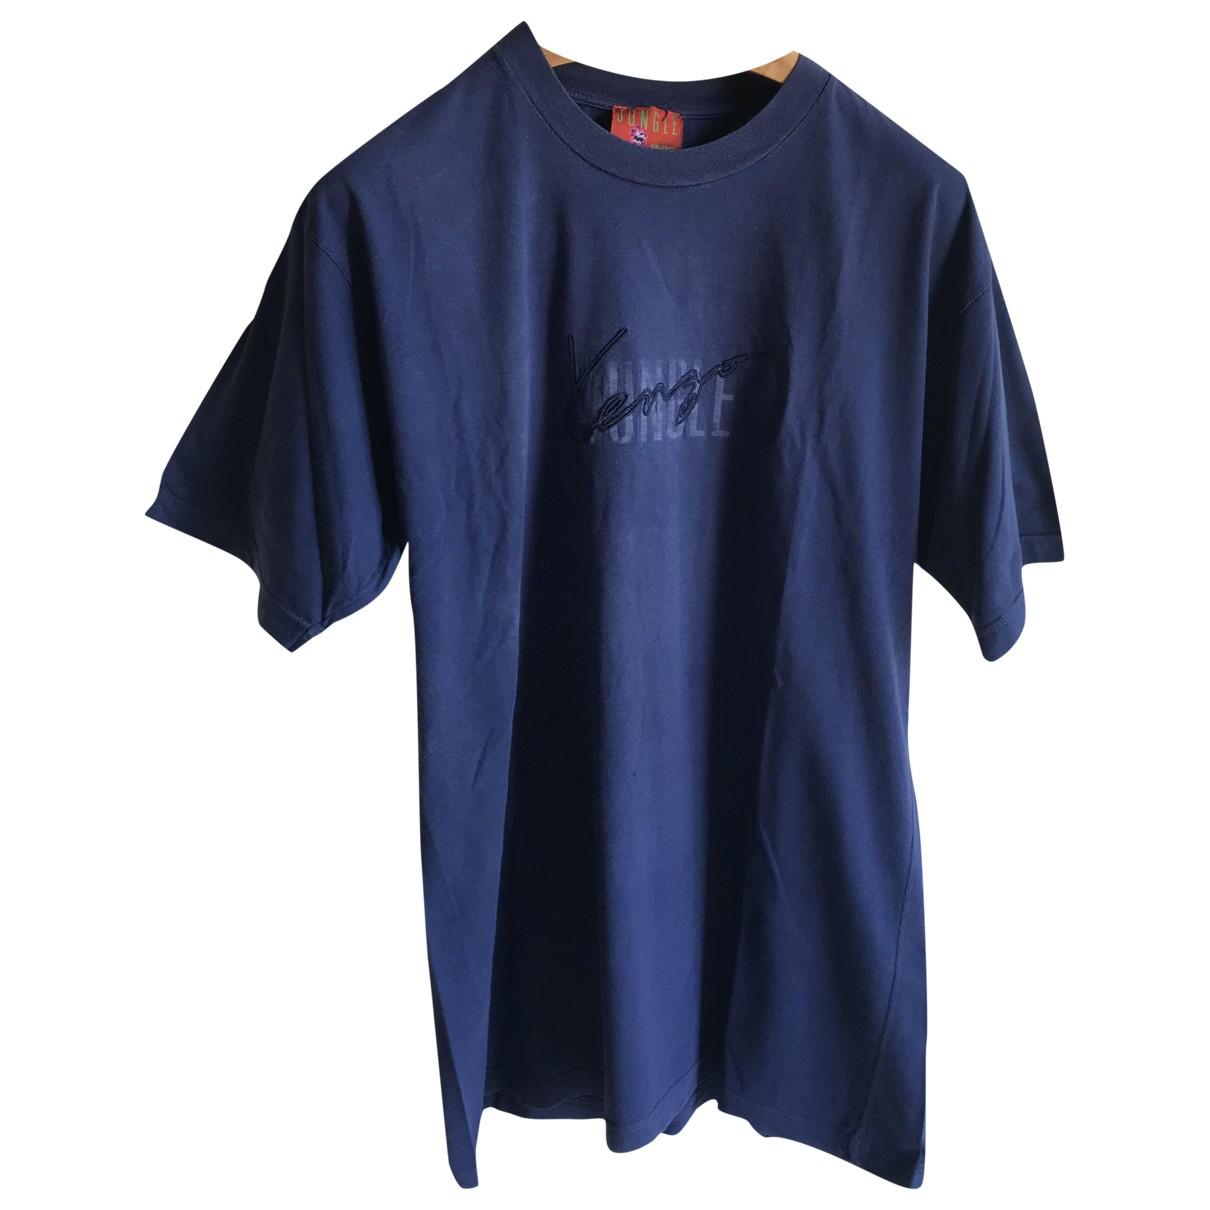 Kenzo N Blue Cotton  top for Women XL International